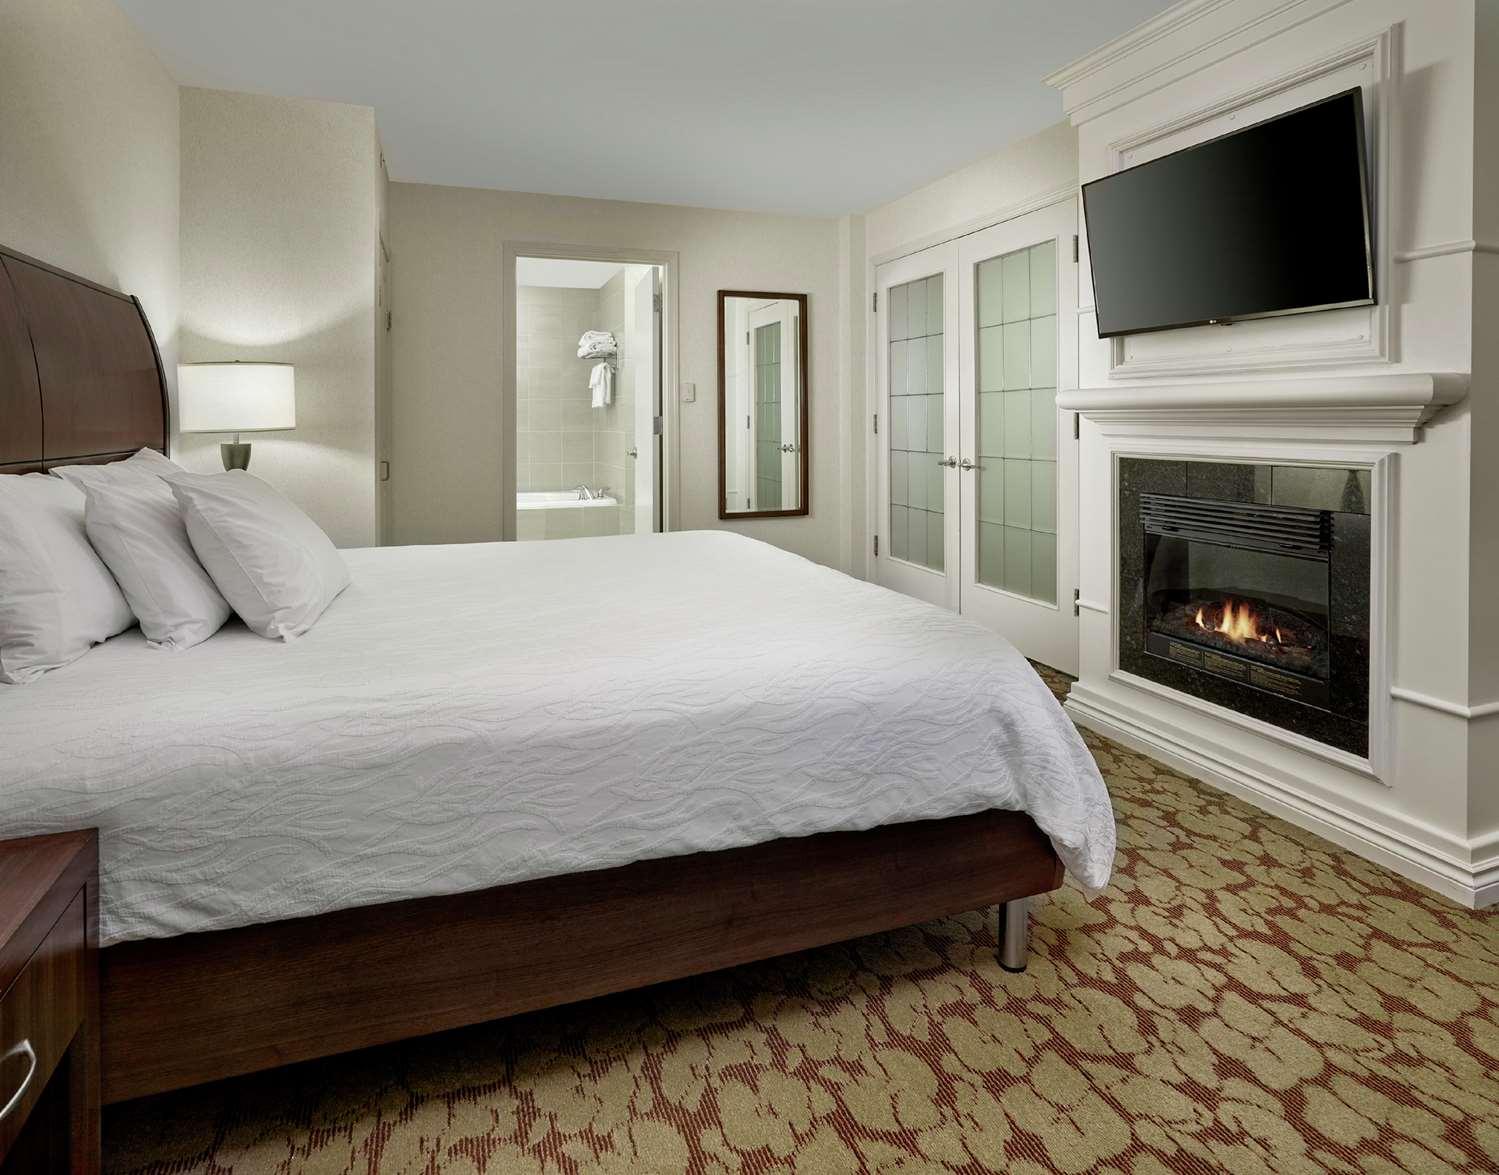 Amenities - Hilton Garden Inn West Edmonton